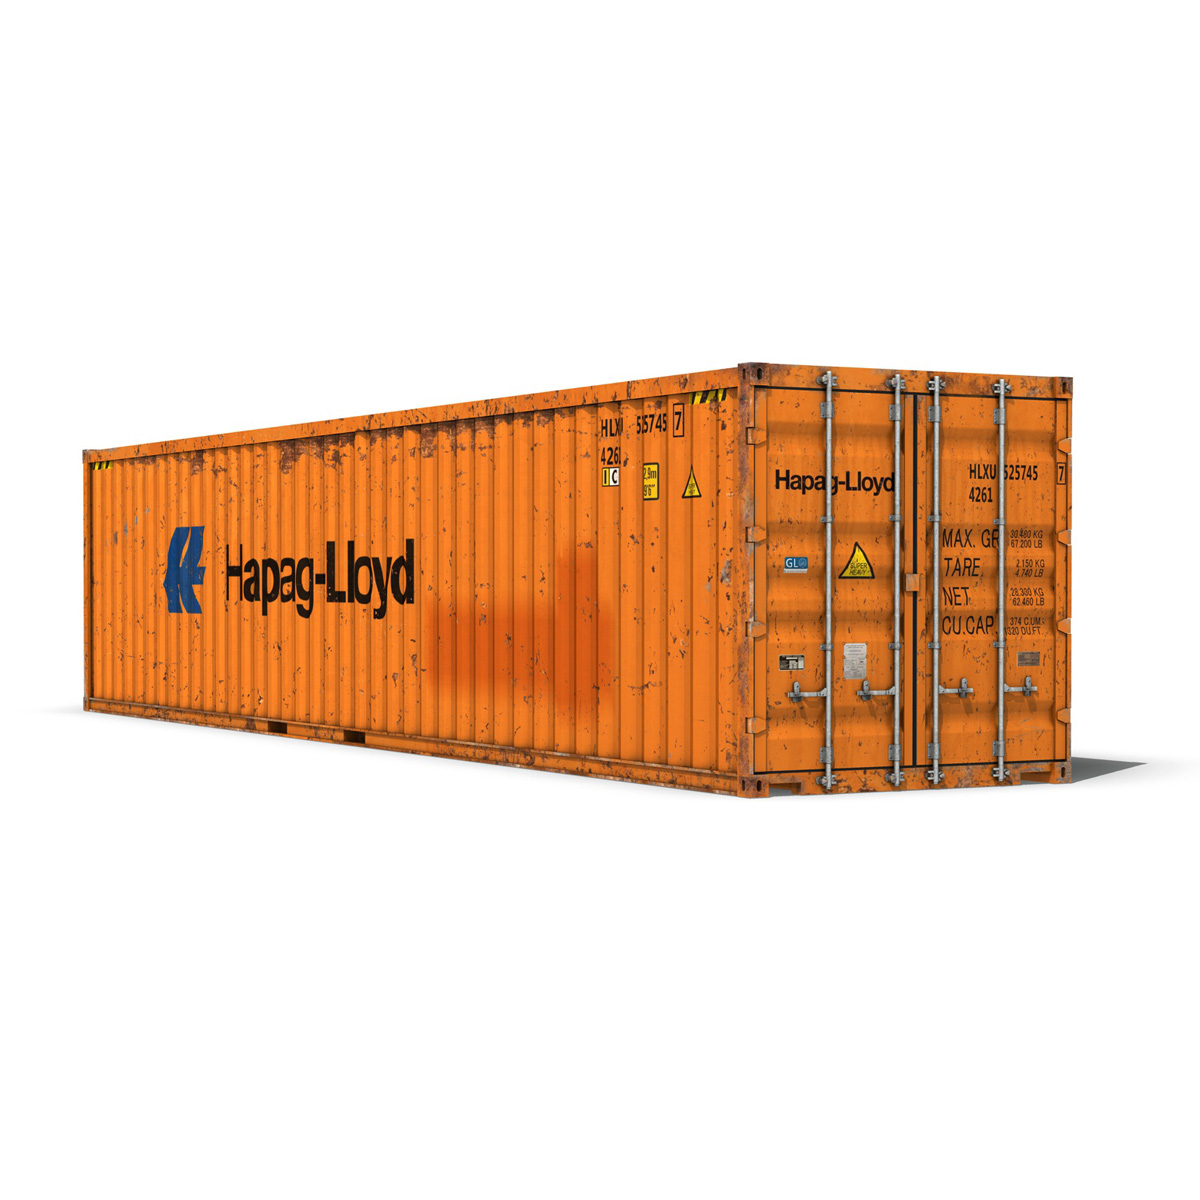 40ft тээврийн чингэлэг - hapag lloyd 3d загвар 3ds fbx lwo lws obj c4d 264959